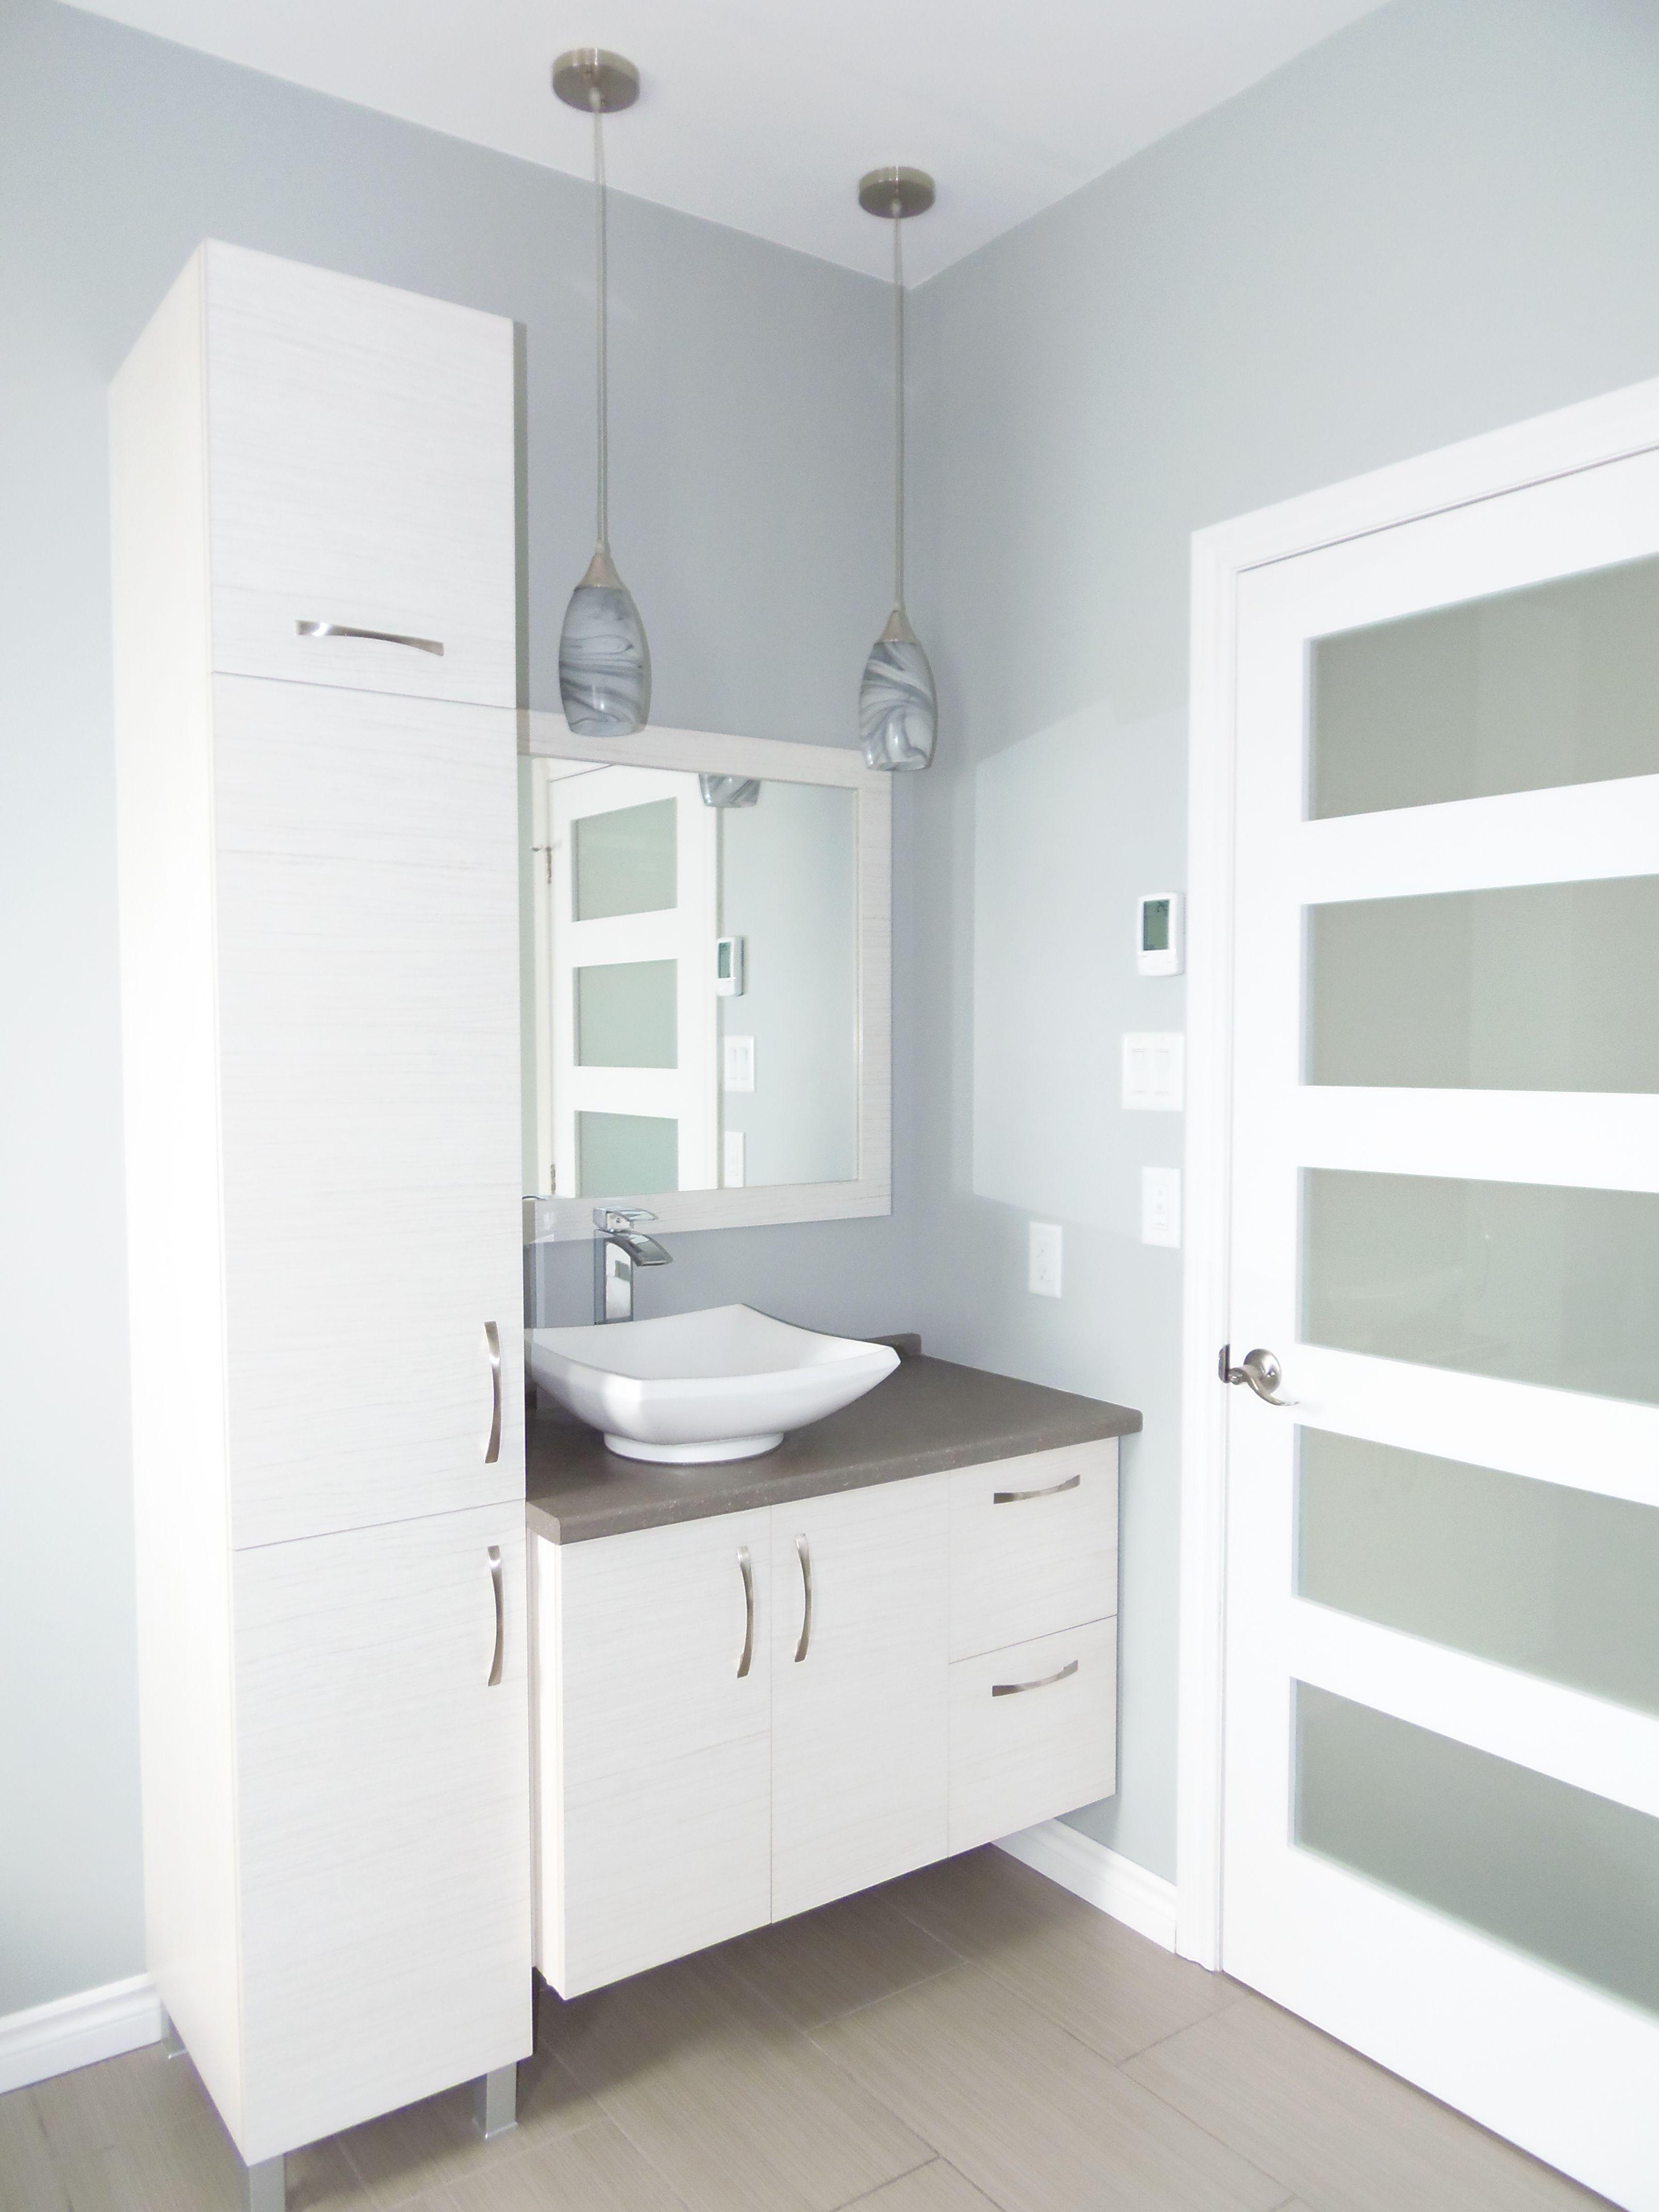 salle de bain contemporaine salle de bain en 2019 pinterest bathroom bathroom cupboards. Black Bedroom Furniture Sets. Home Design Ideas